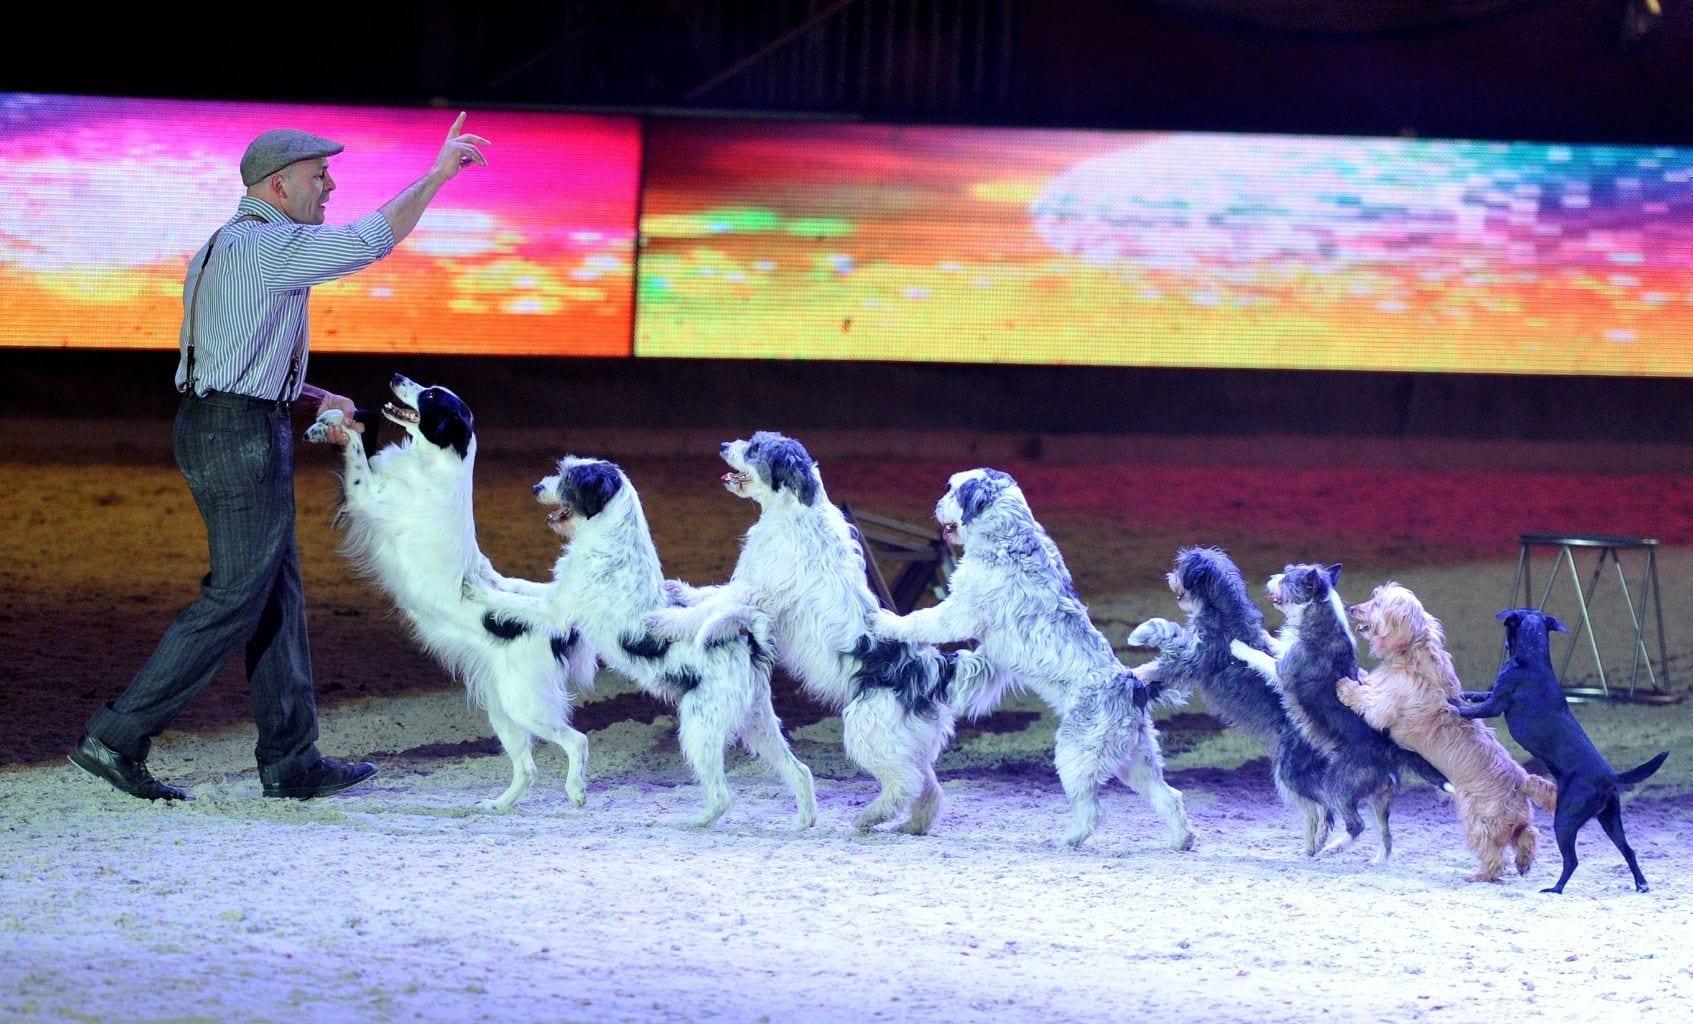 Showtime! Wolfgang Lauenburgers Hunde sind wieder los bei der Amadeus Horse Indoors 2017. © Nini Schäbel